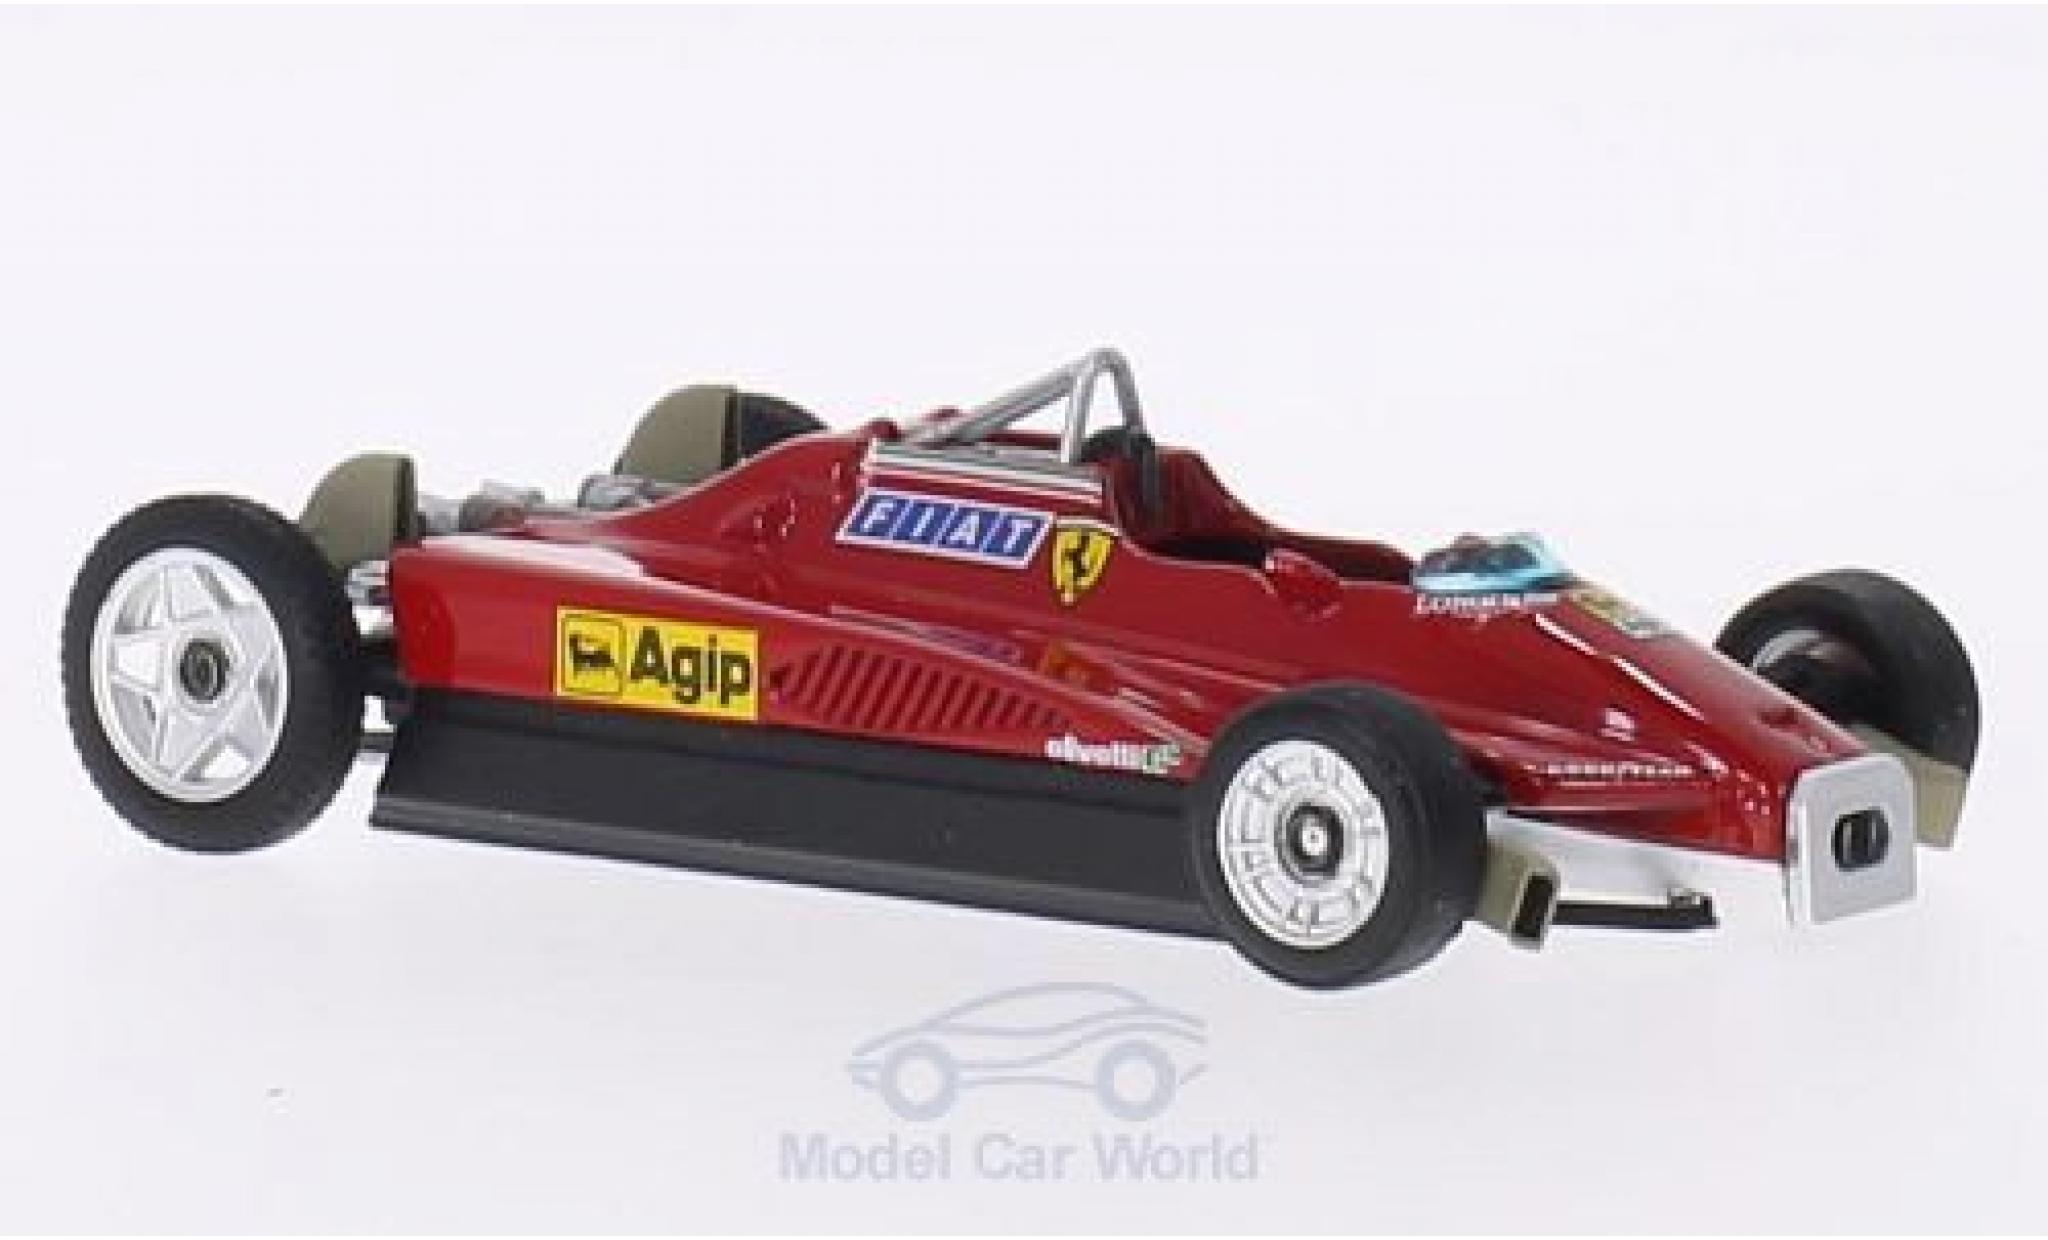 Ferrari 126 1982 1/43 Brumm C2 Turbo Scuderia Formel 1 GP San Marino T-Car / Ersatzfahrzeug